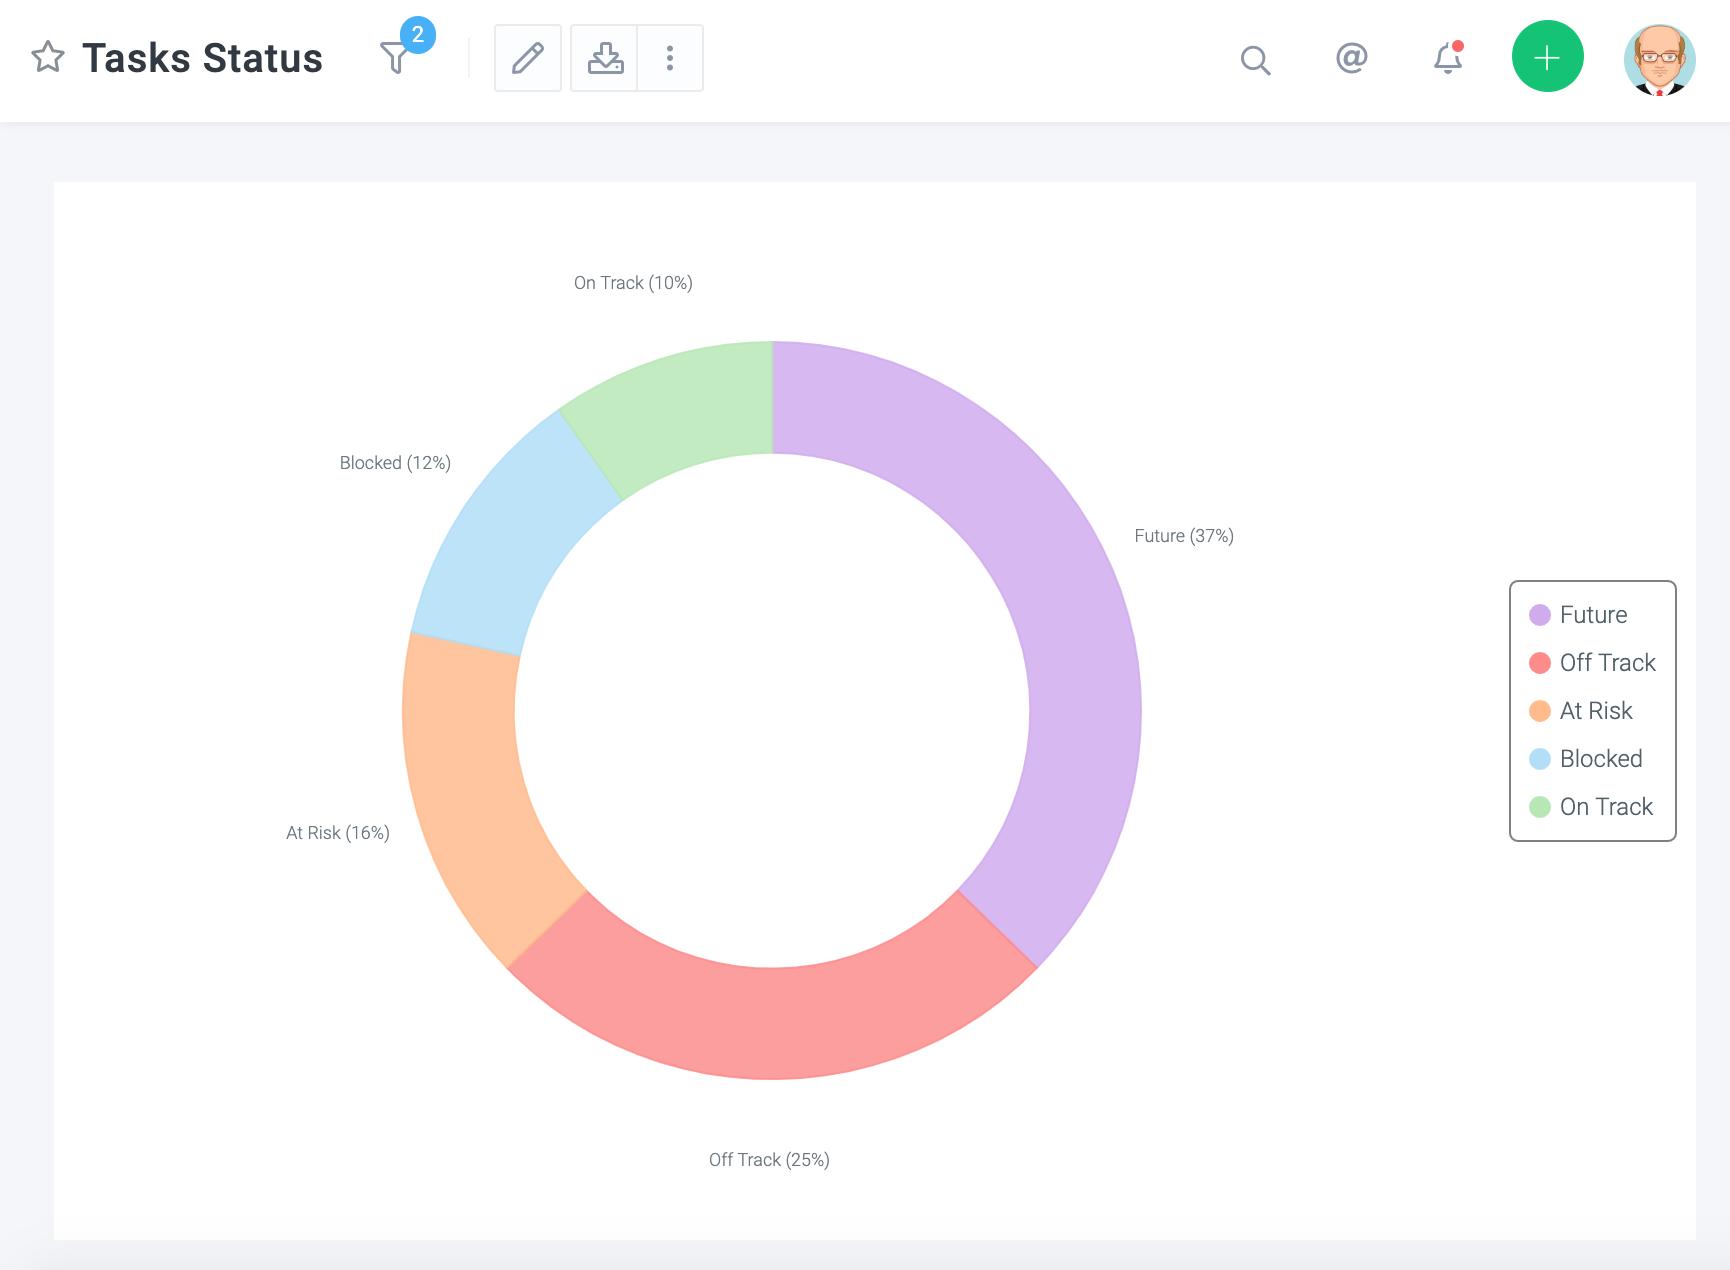 Tasks Status - Pie Chart